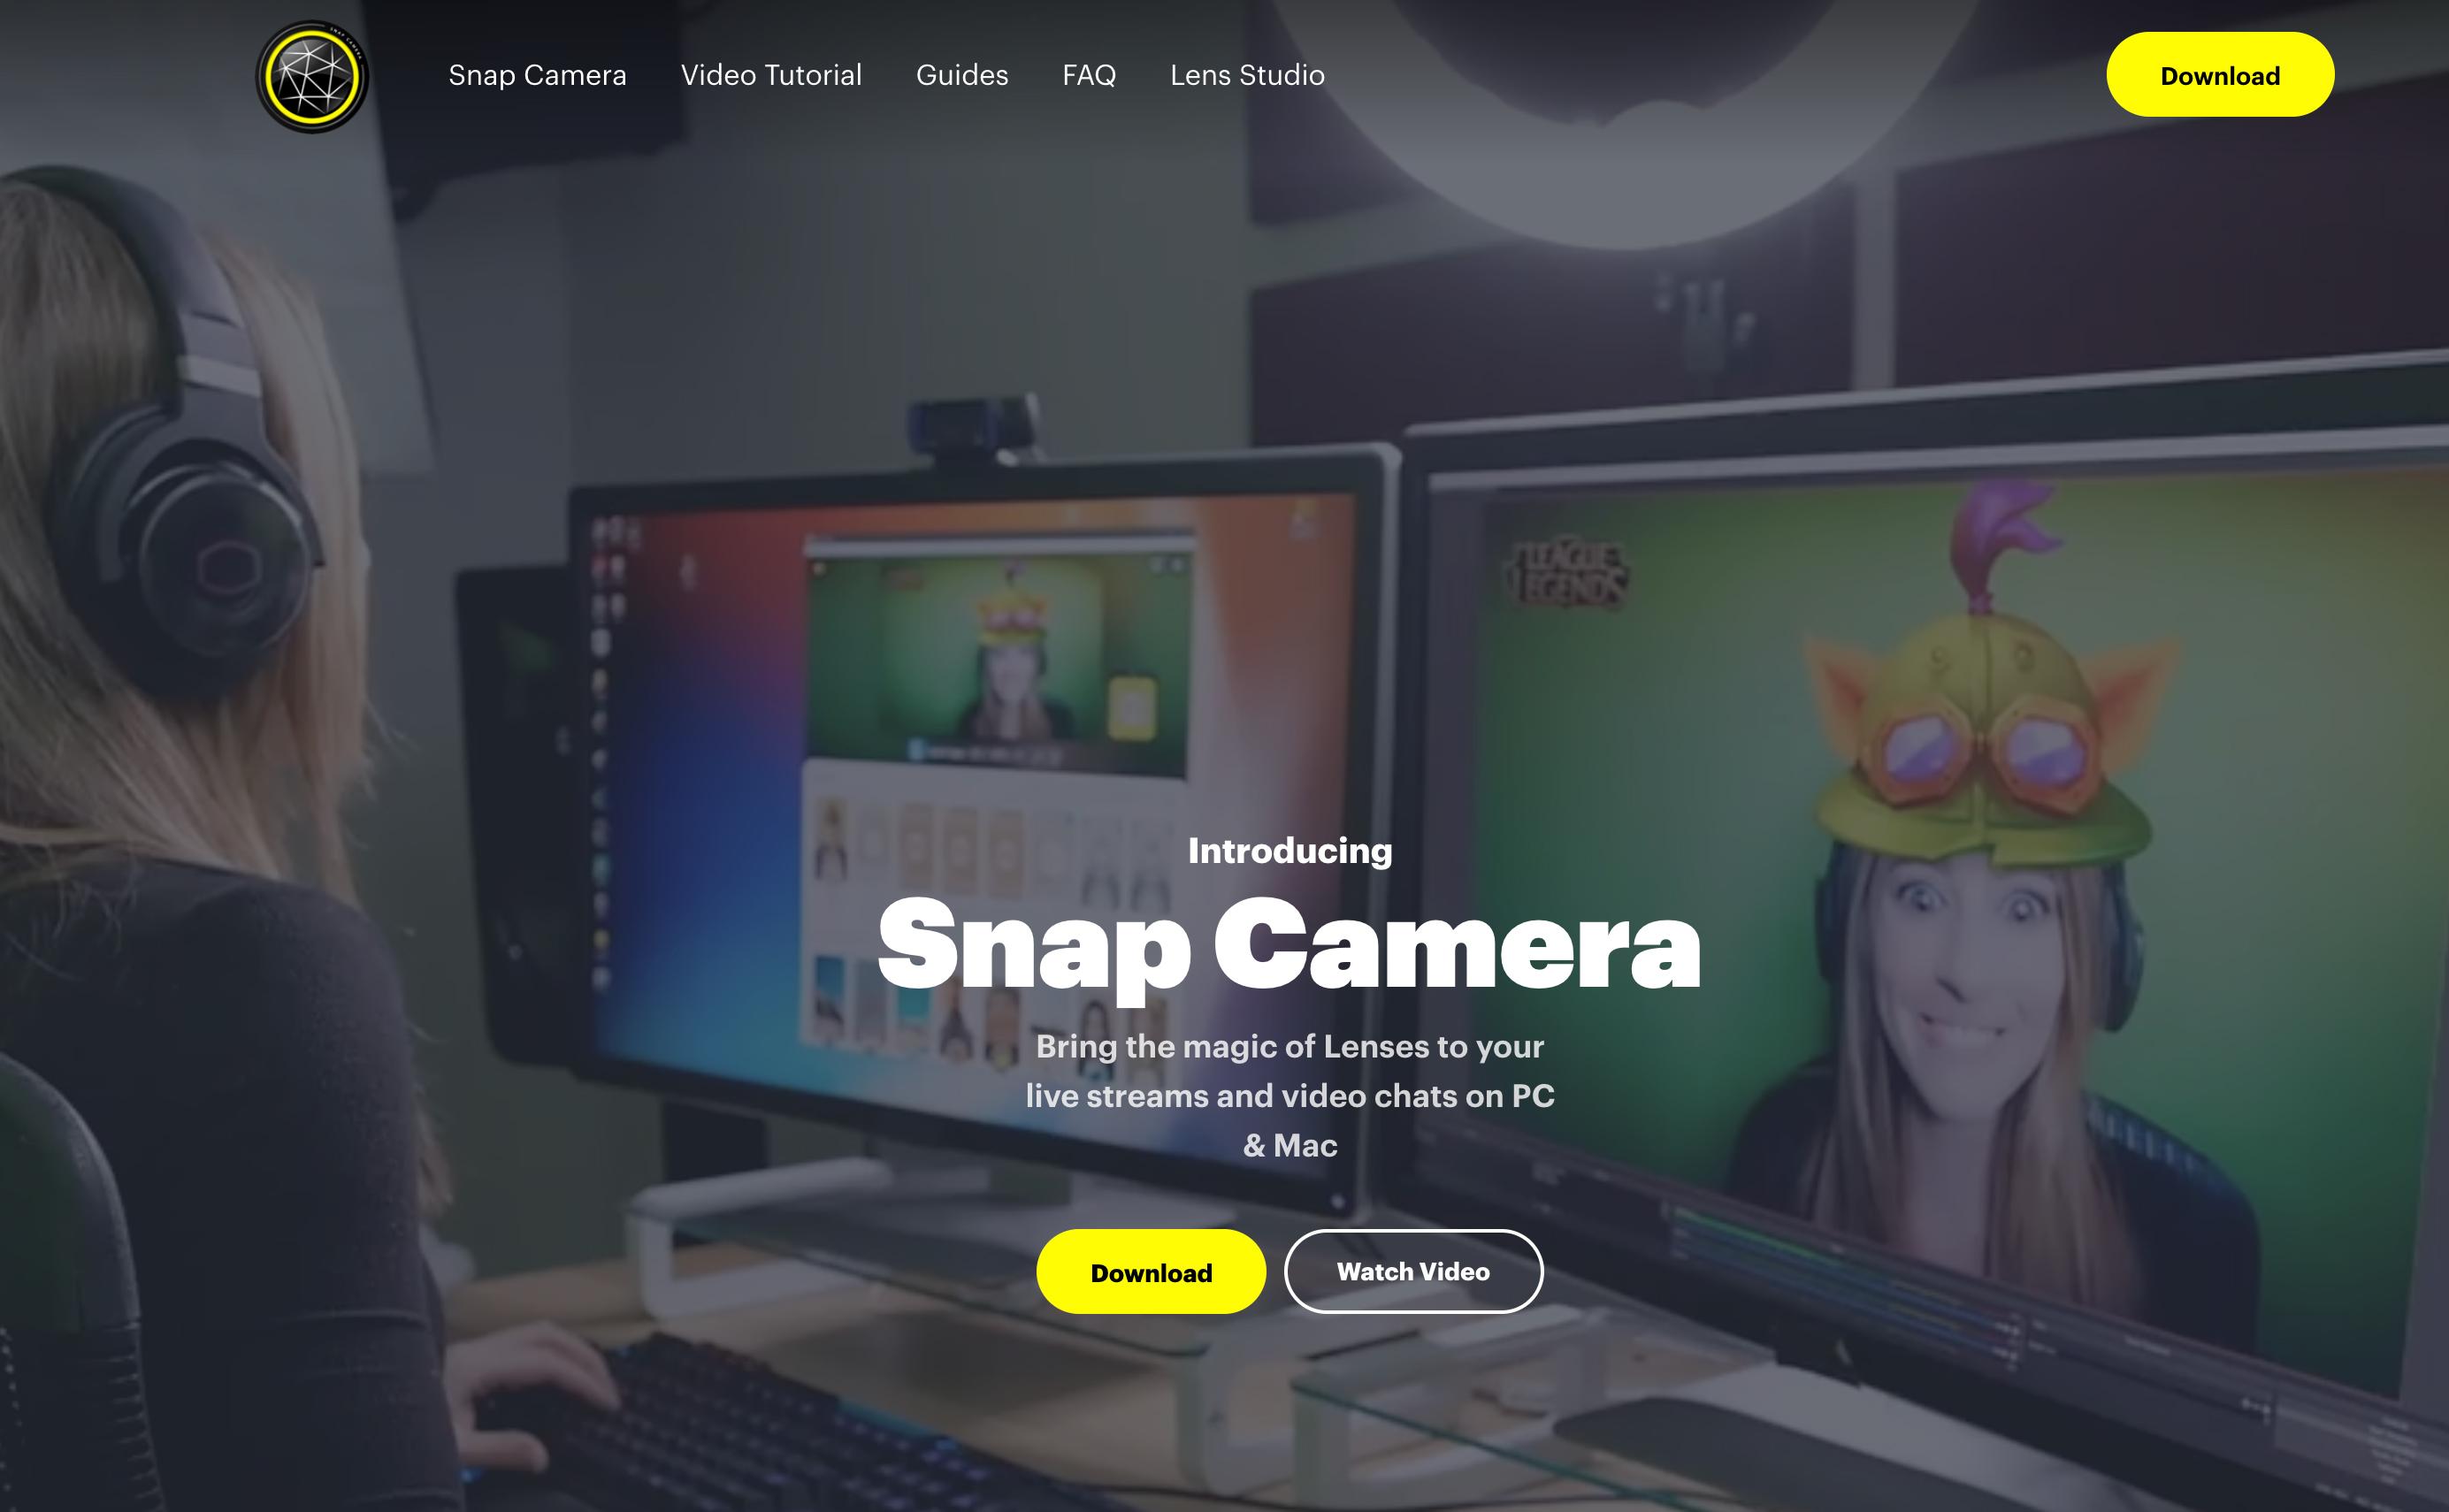 SnapCameraのホームページ